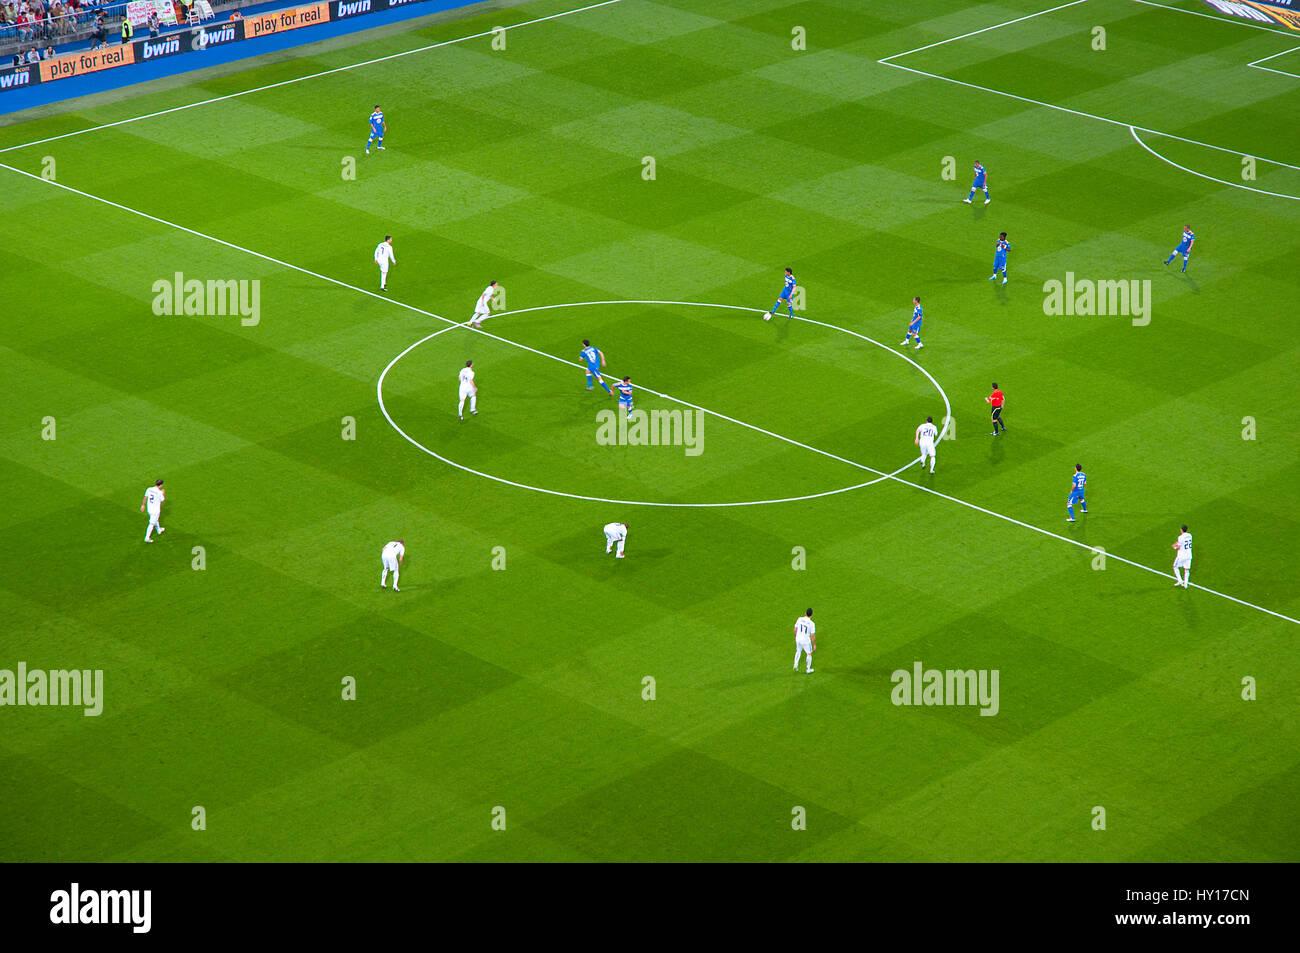 Real Madrid vs Getafe football match. Santiago Bernabeu stadium, Madrid, Spain. - Stock Image